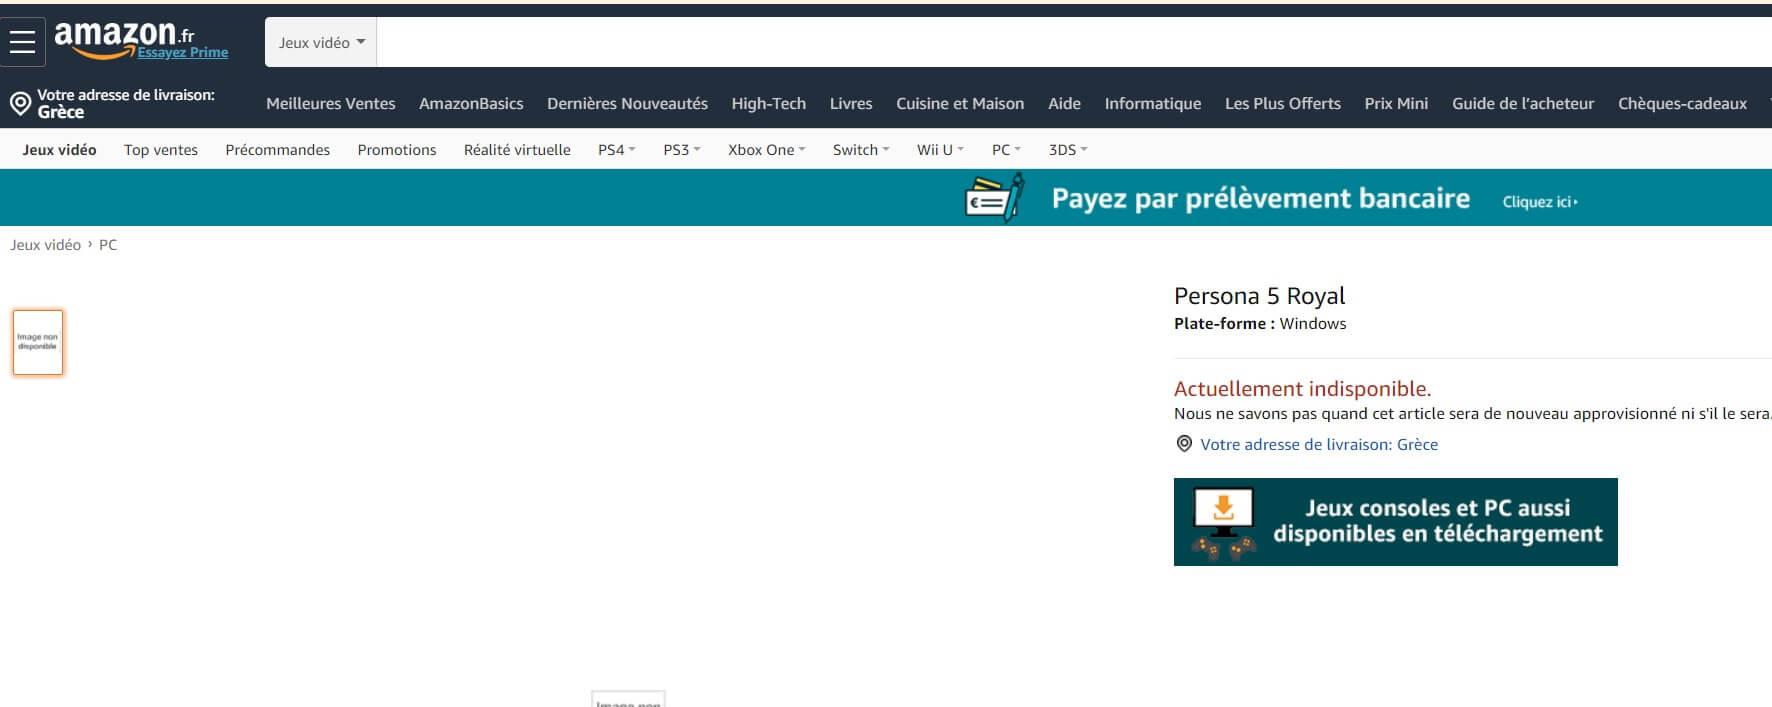 Amazon تسرد فرنسا أيضًا Persona 5 Royal للكمبيوتر الشخصي 1